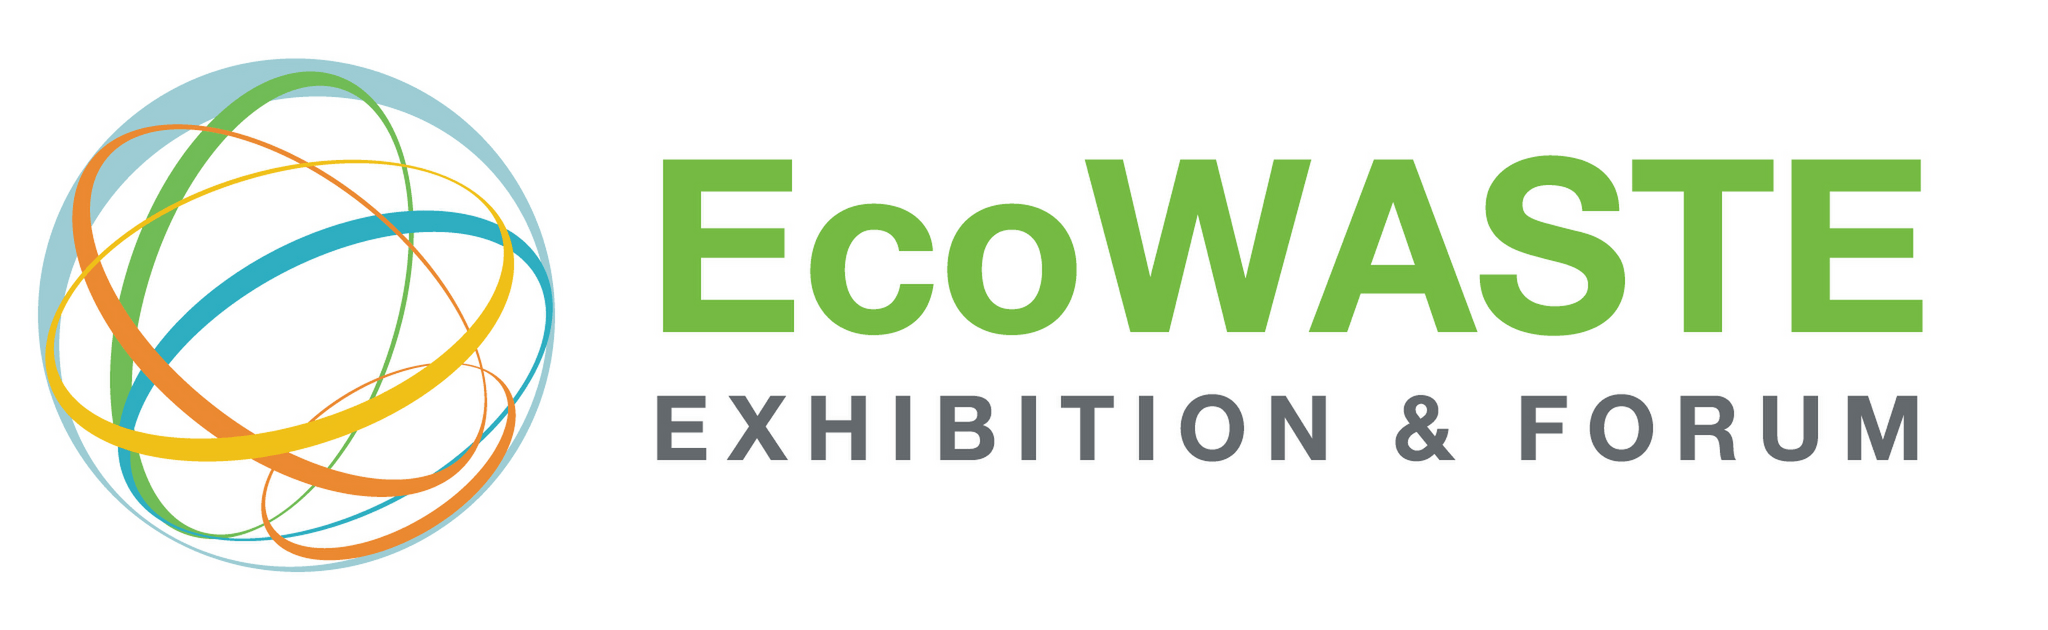 UAE 아부다비 재활용 박람회 2021 (ECOWASTE 2021)